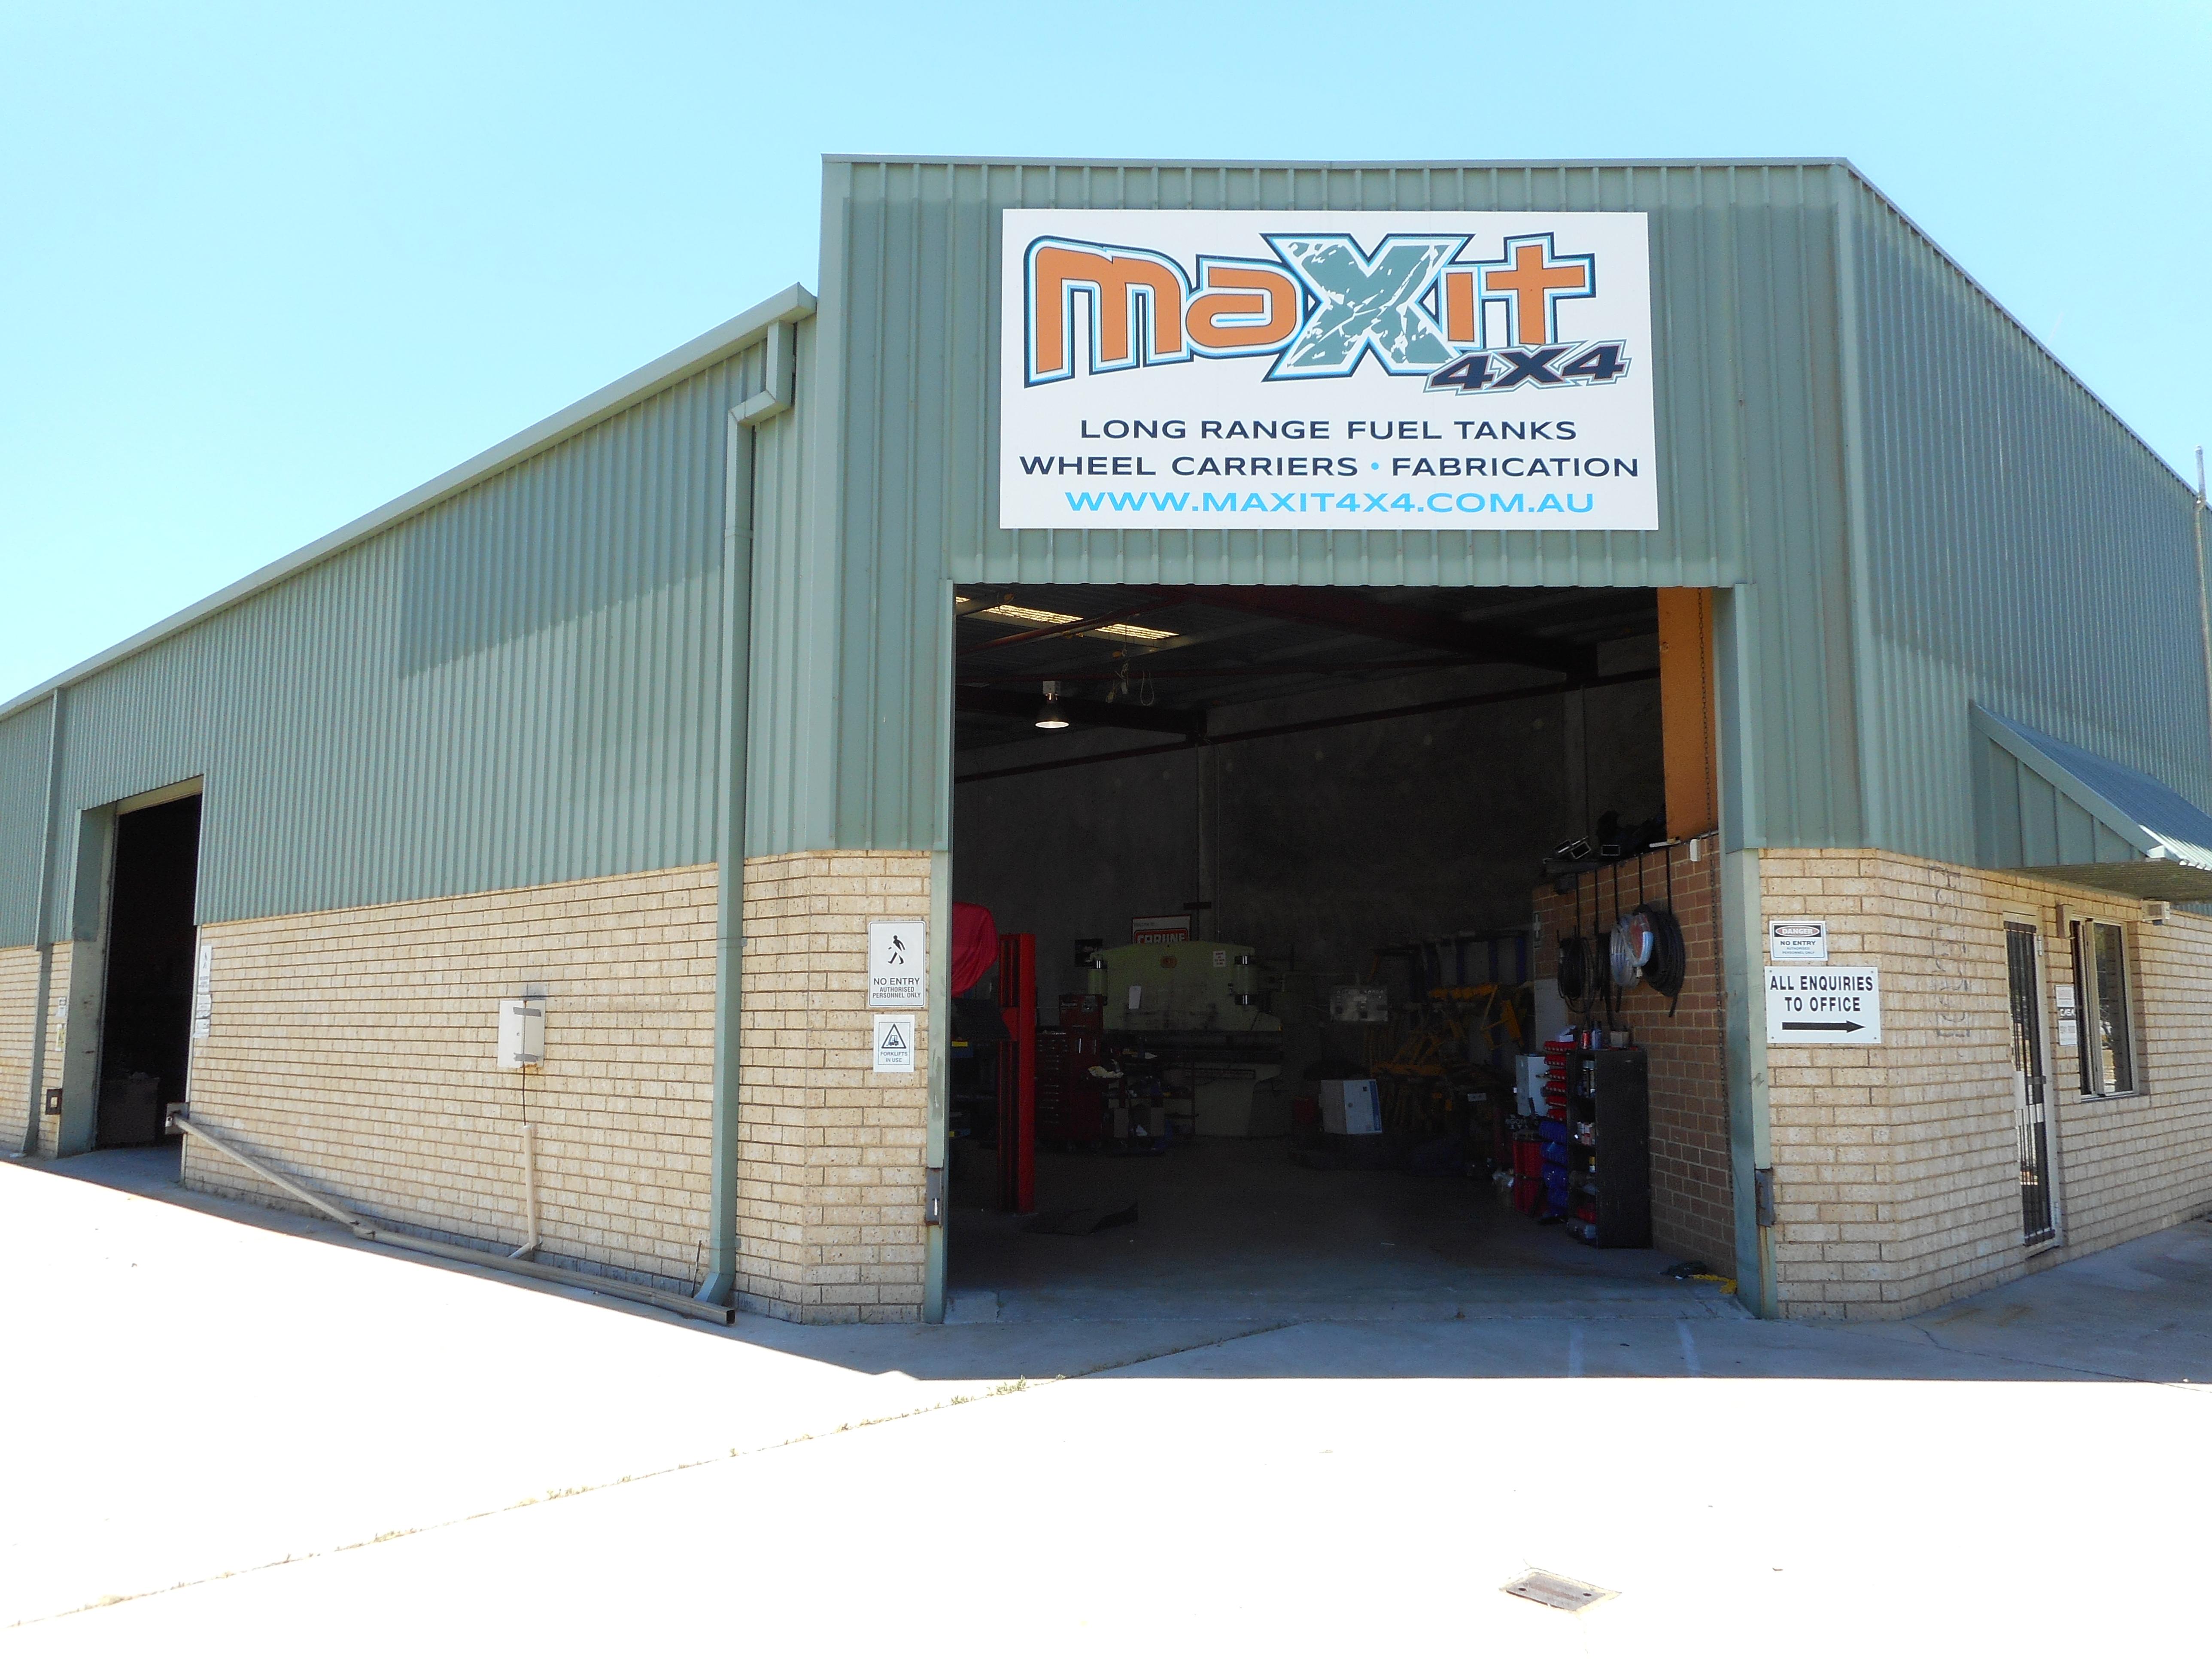 Maxit 4x4 Factory